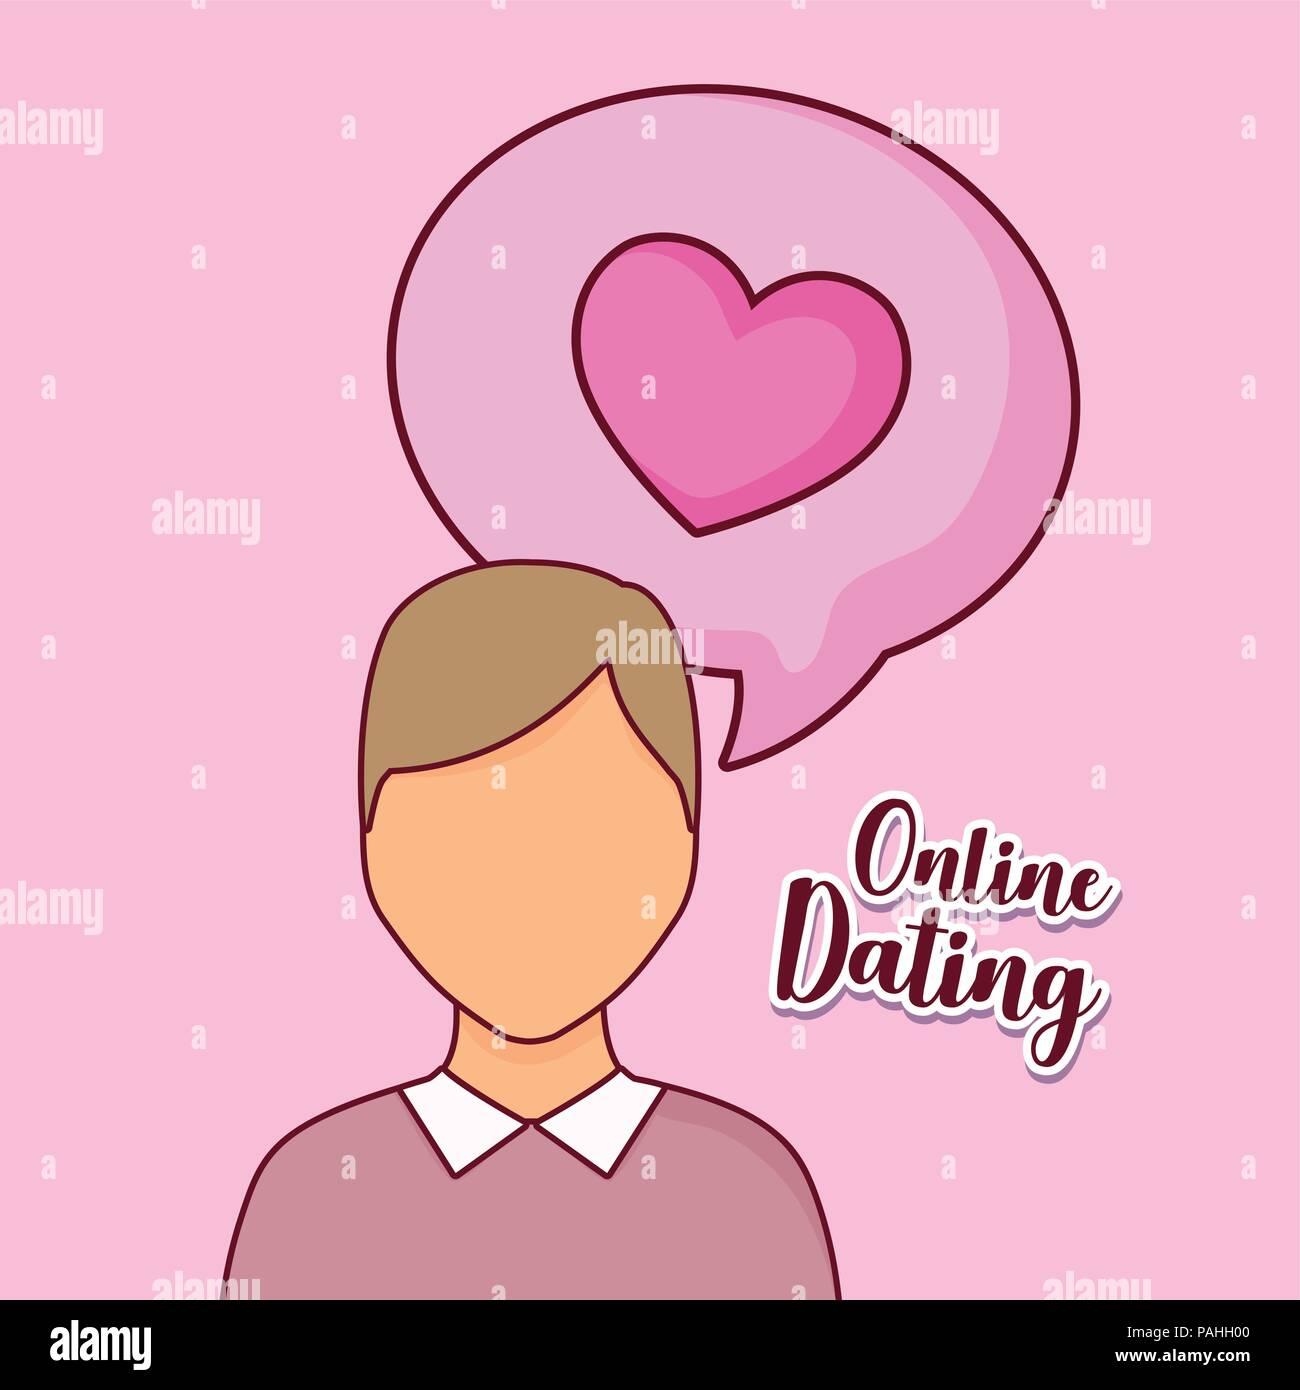 beste man speech online dating gratis gay dating Blackpool